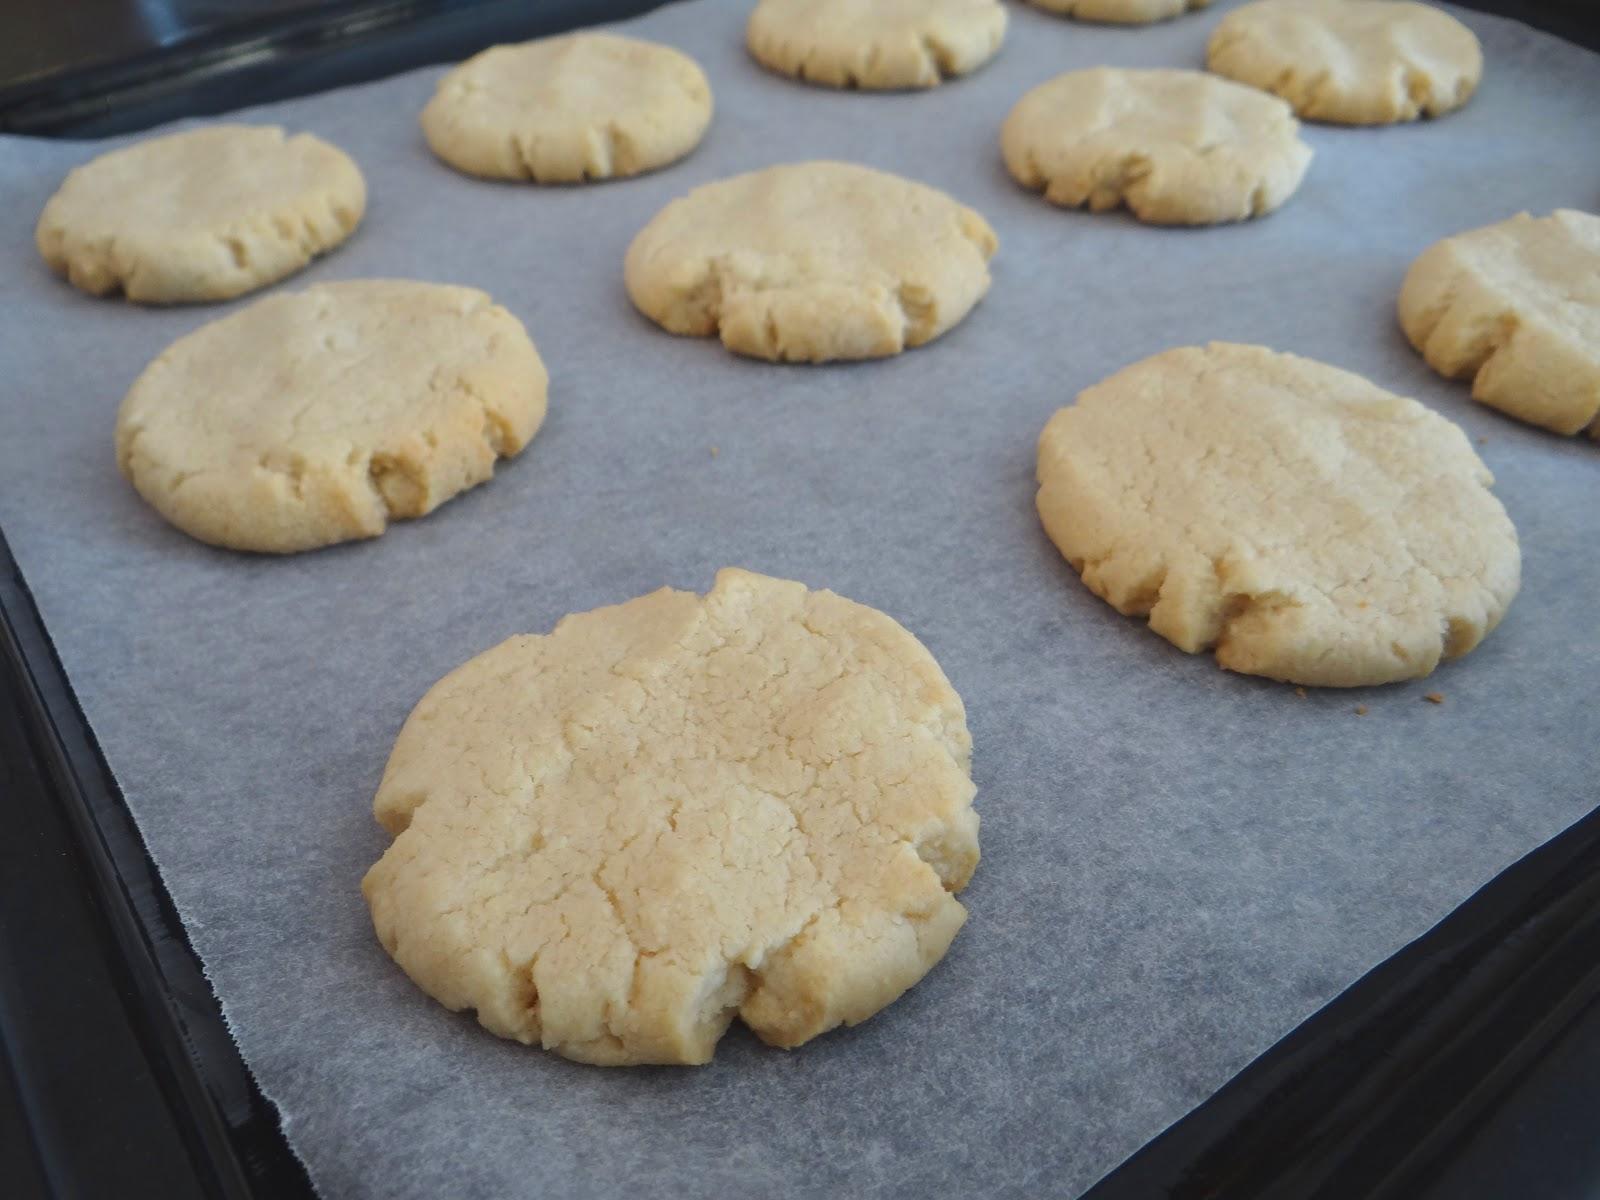 Words & Cake | Bake, Eat, Write, Read: Tahini & Almond Cookies